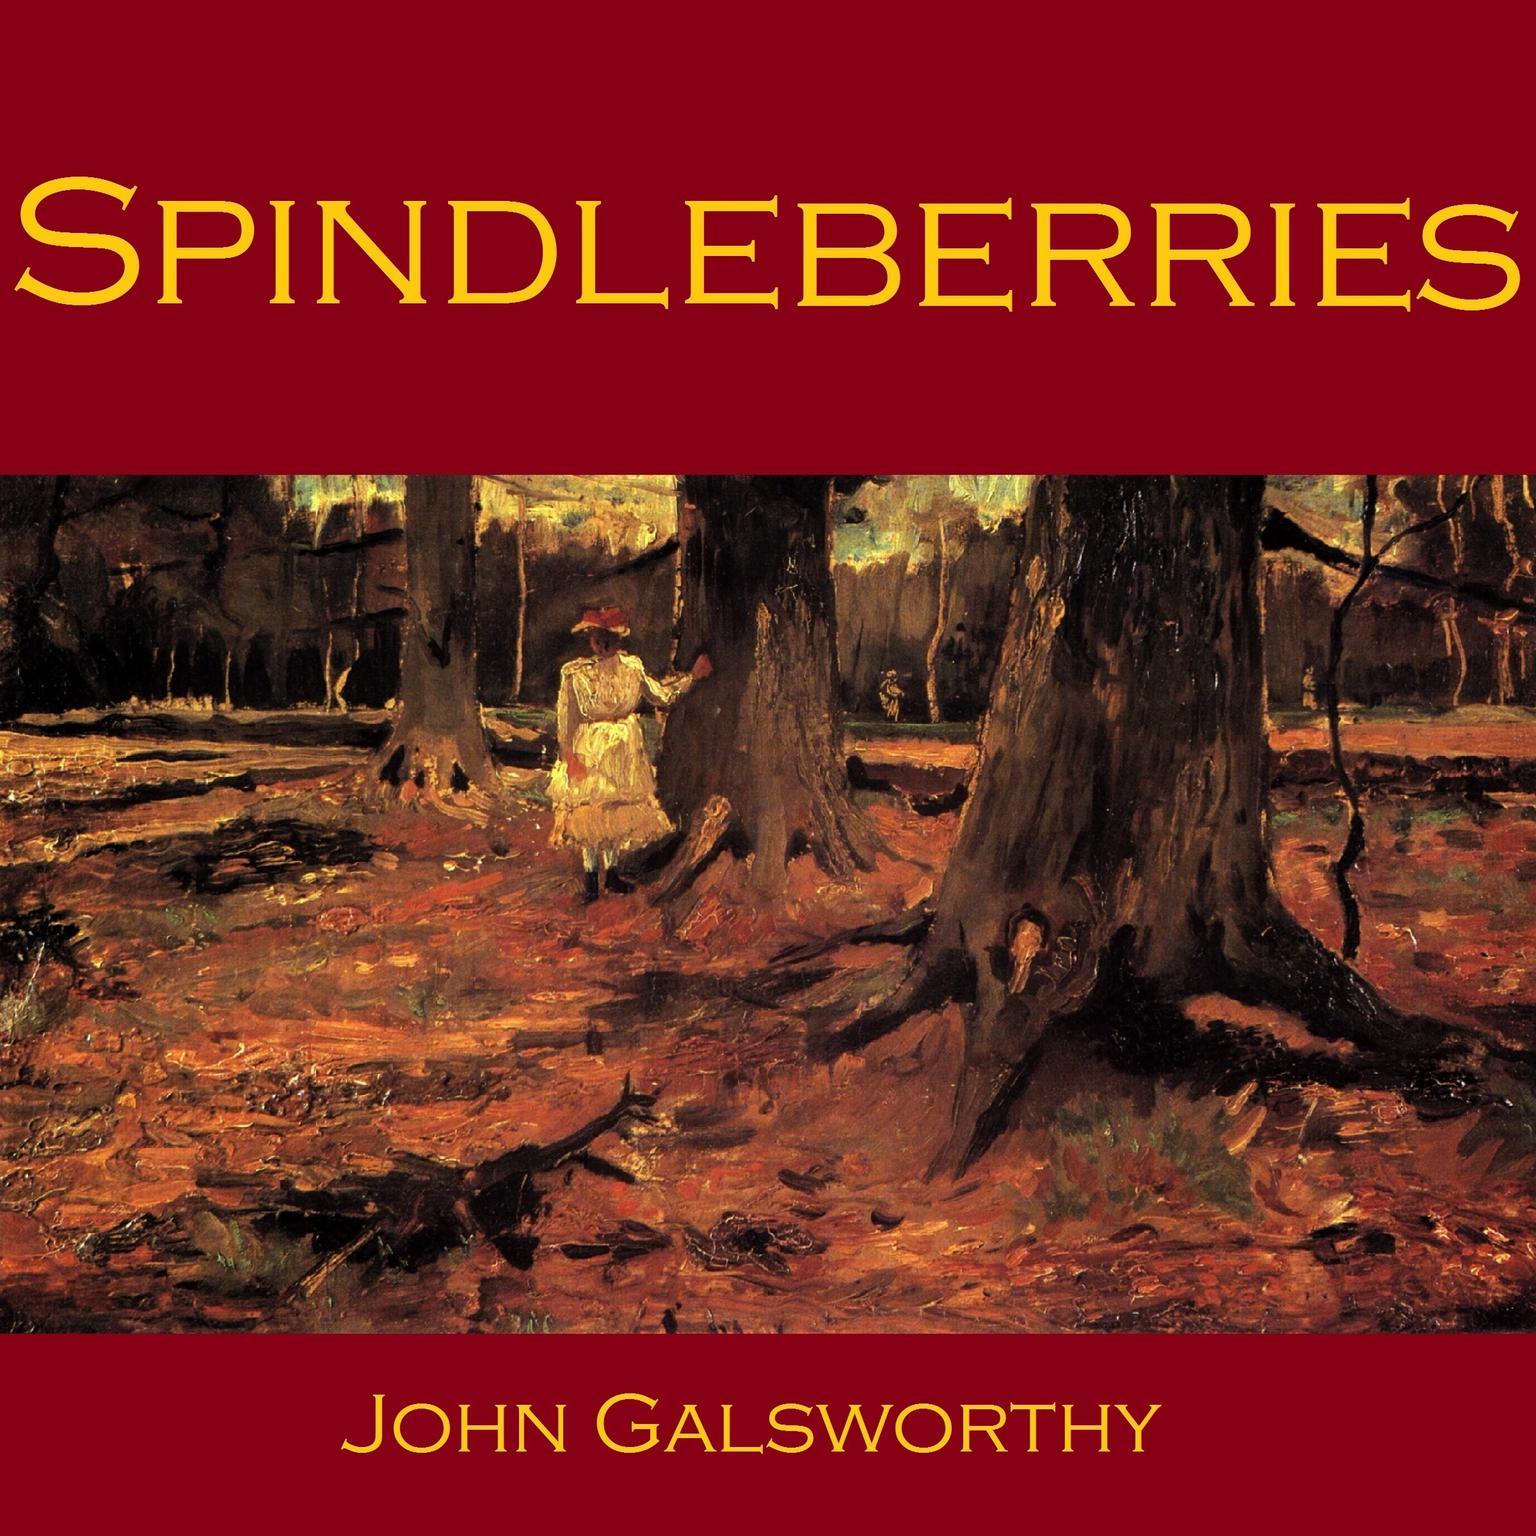 Spindleberries Audiobook, by John Galsworthy